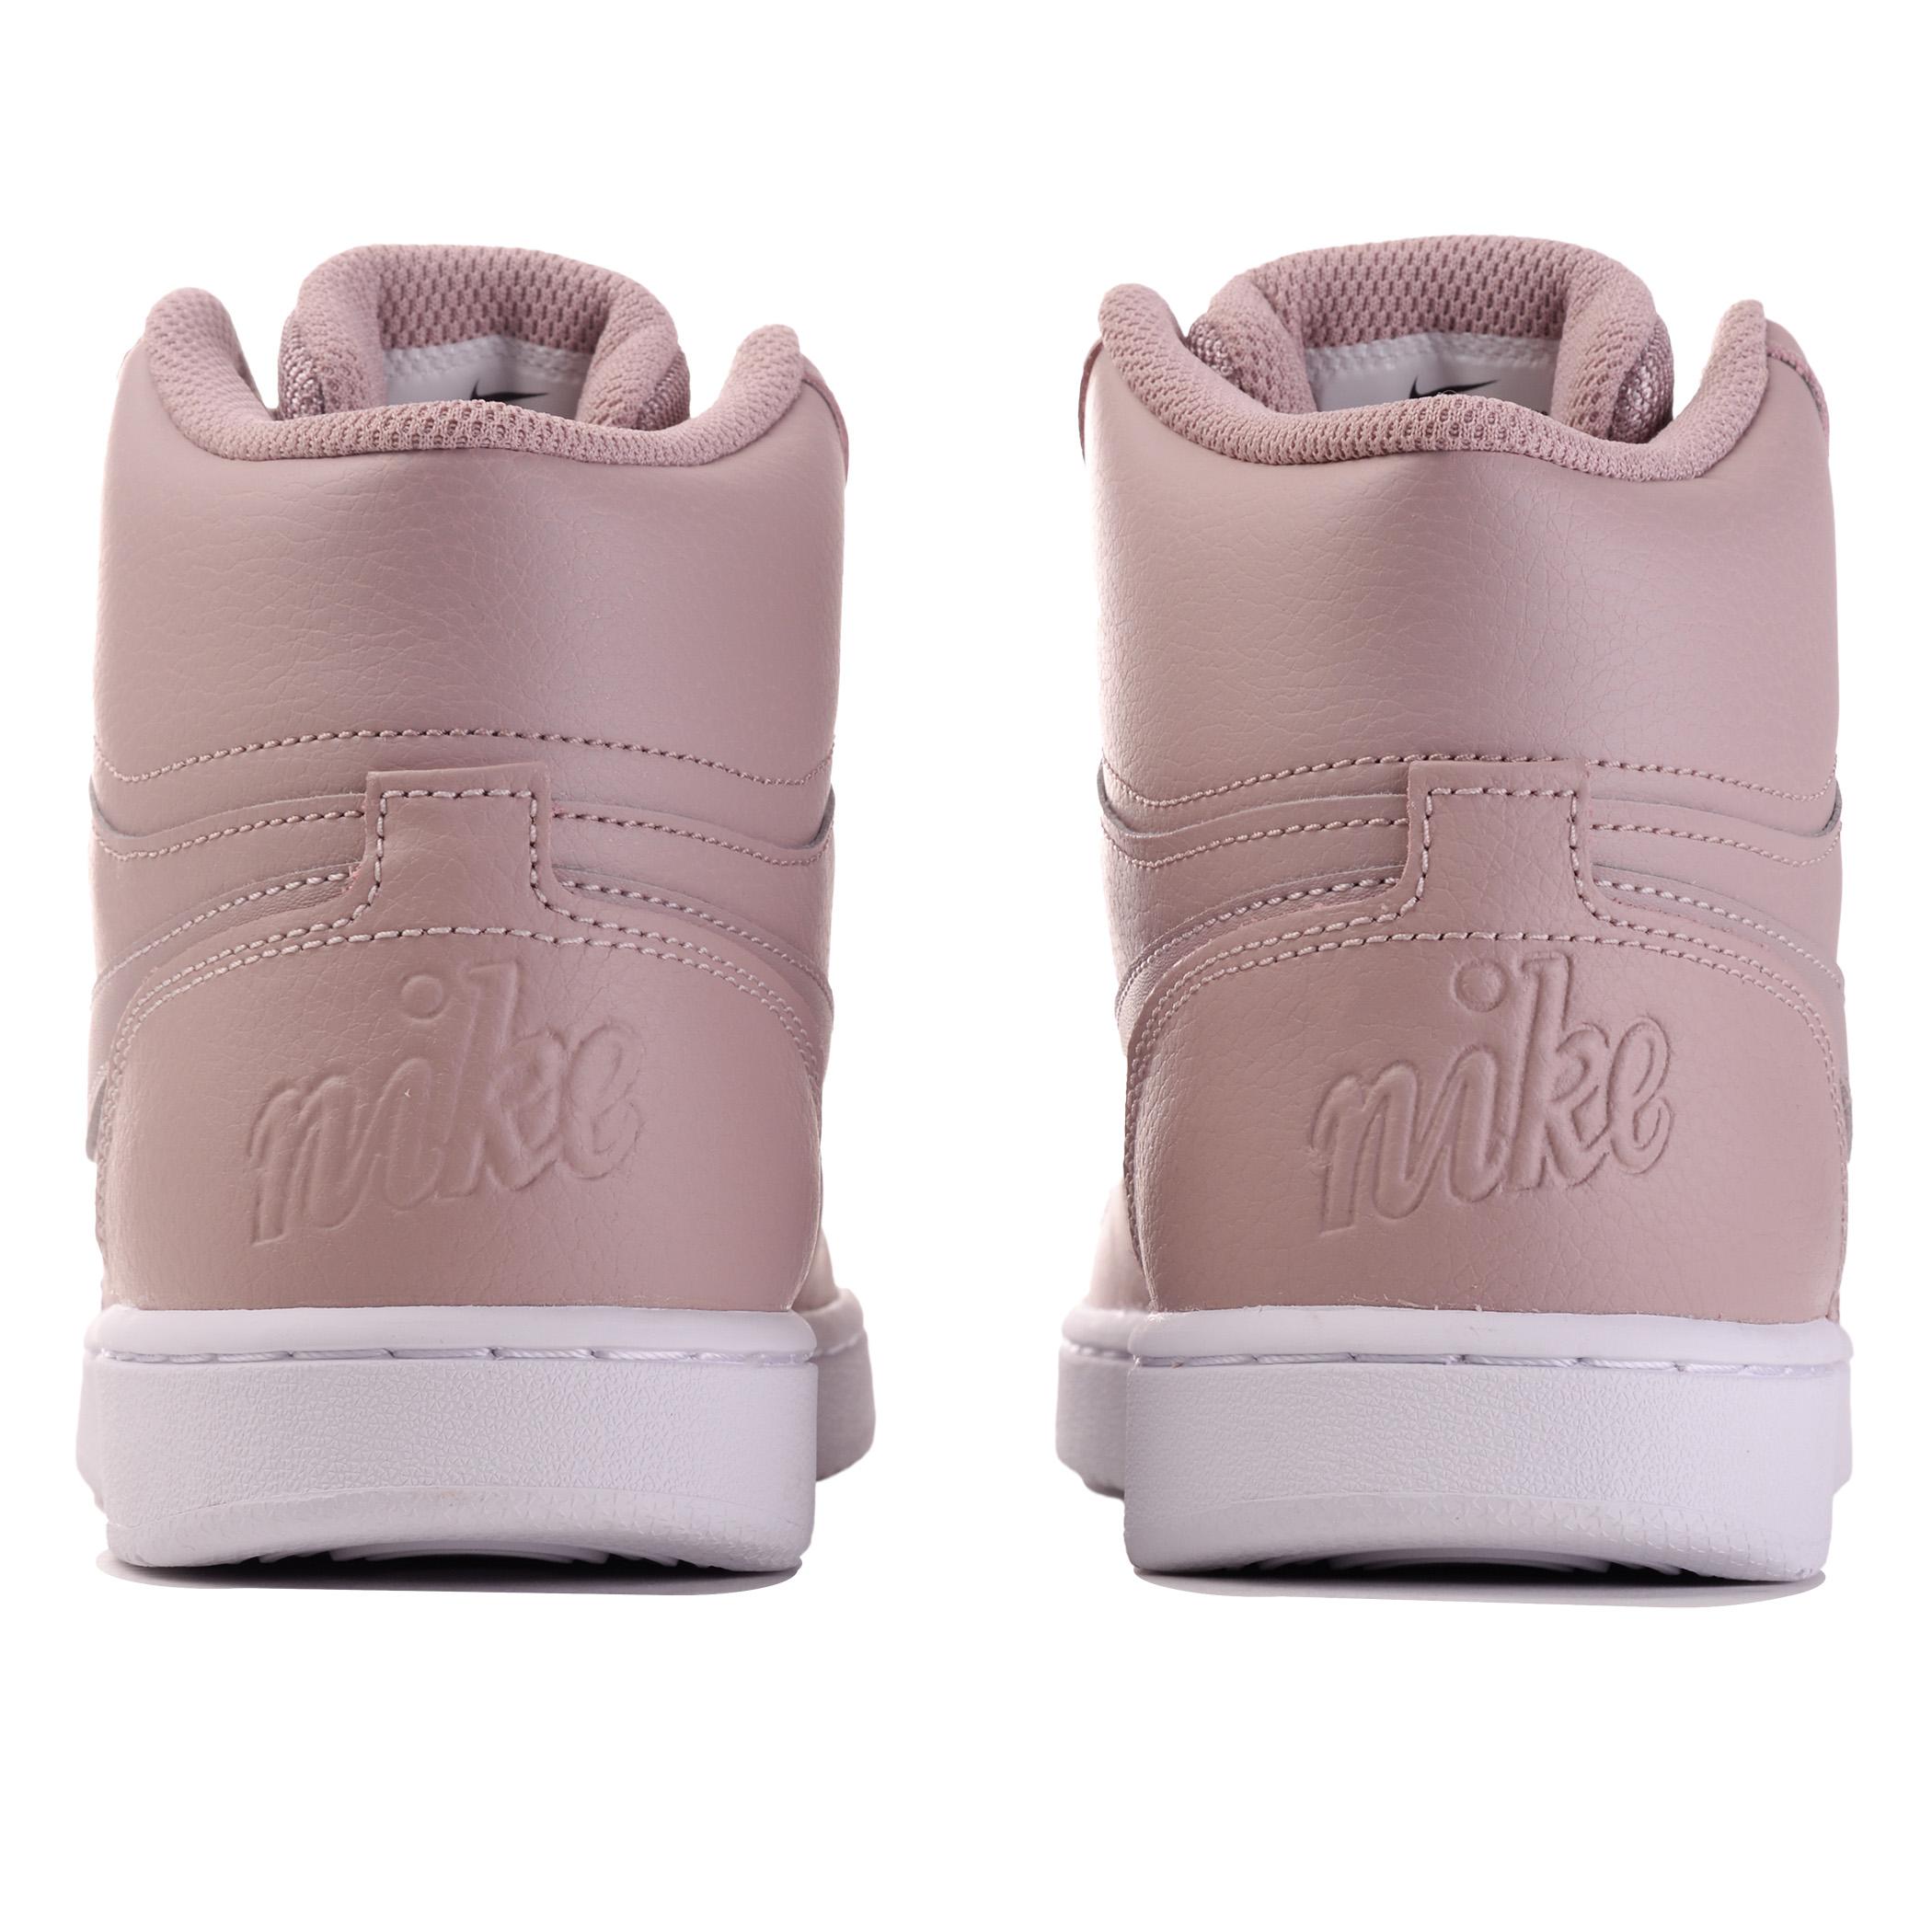 c4244e38 Женские кеды Nike EBERNON MID Diffused Taupe/Diffused Taupe - фото 4